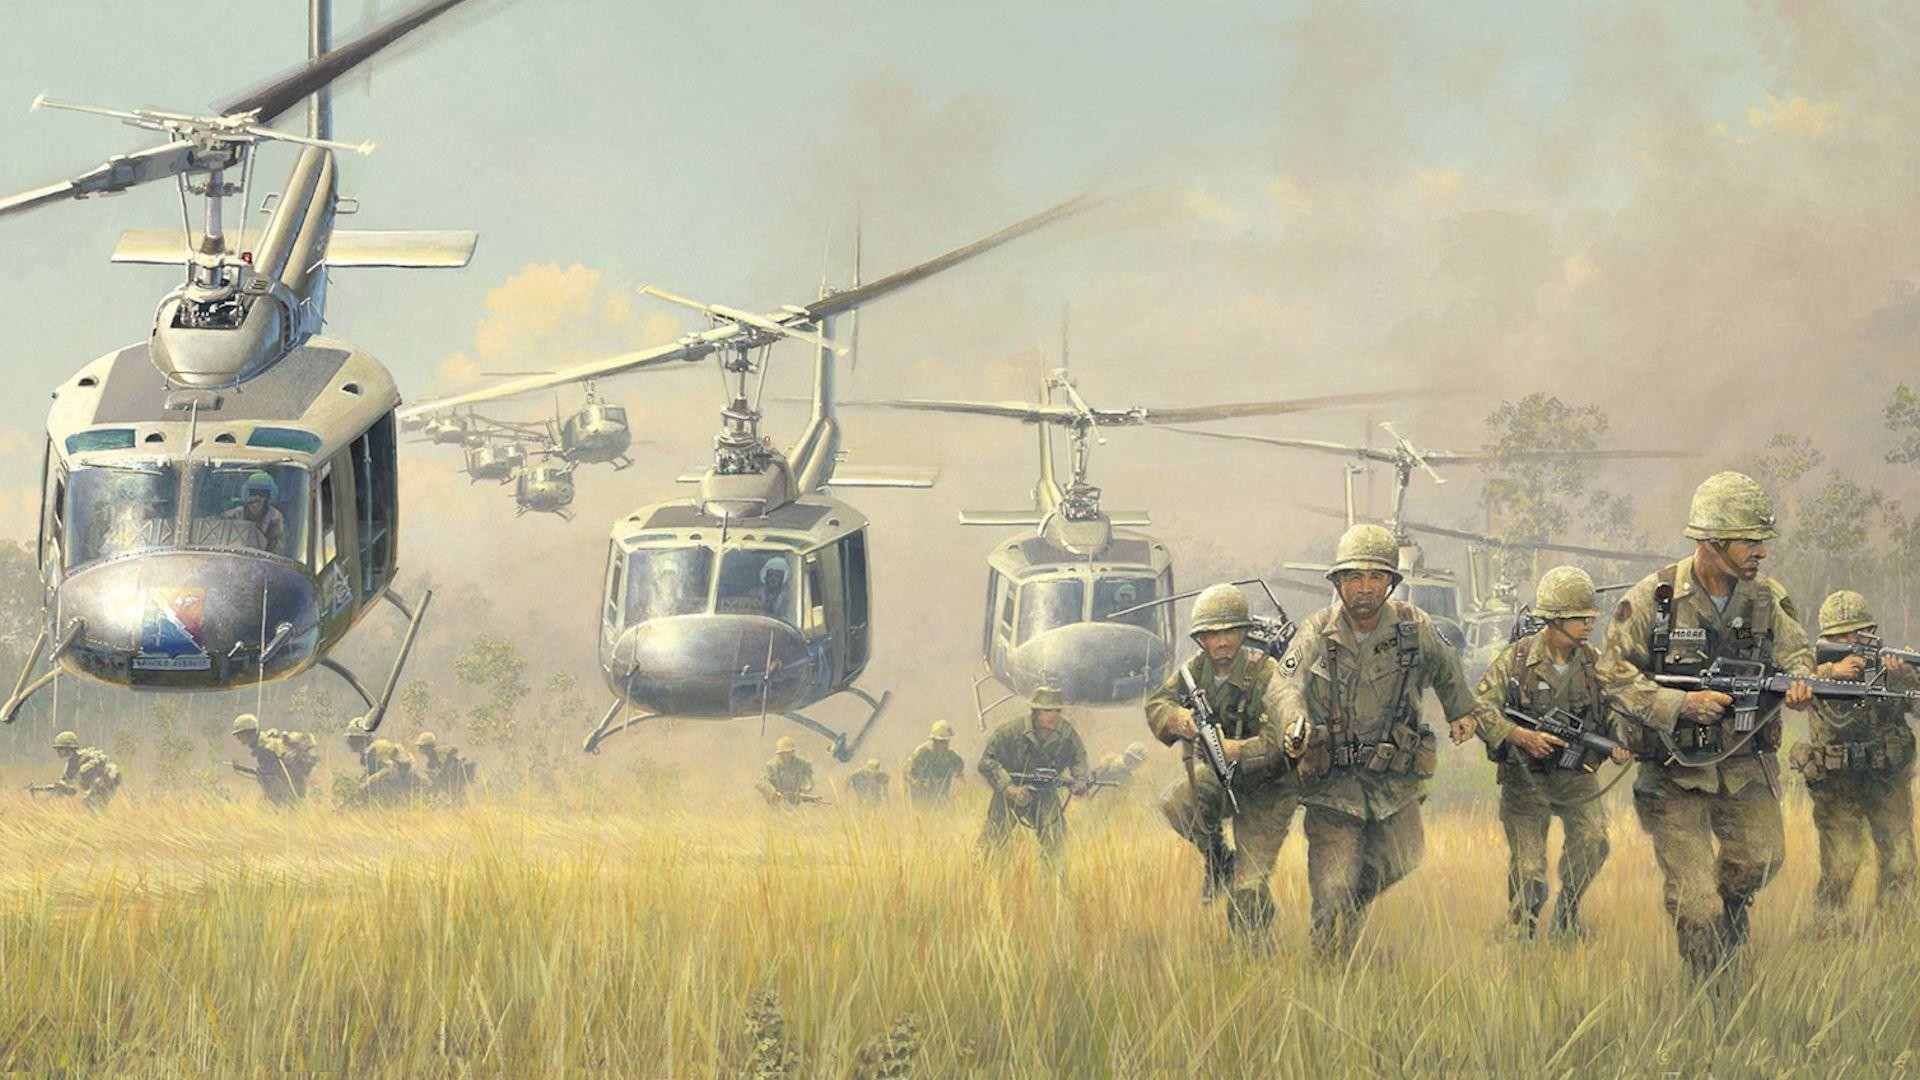 Vietnam War Wallpaper 50 Images